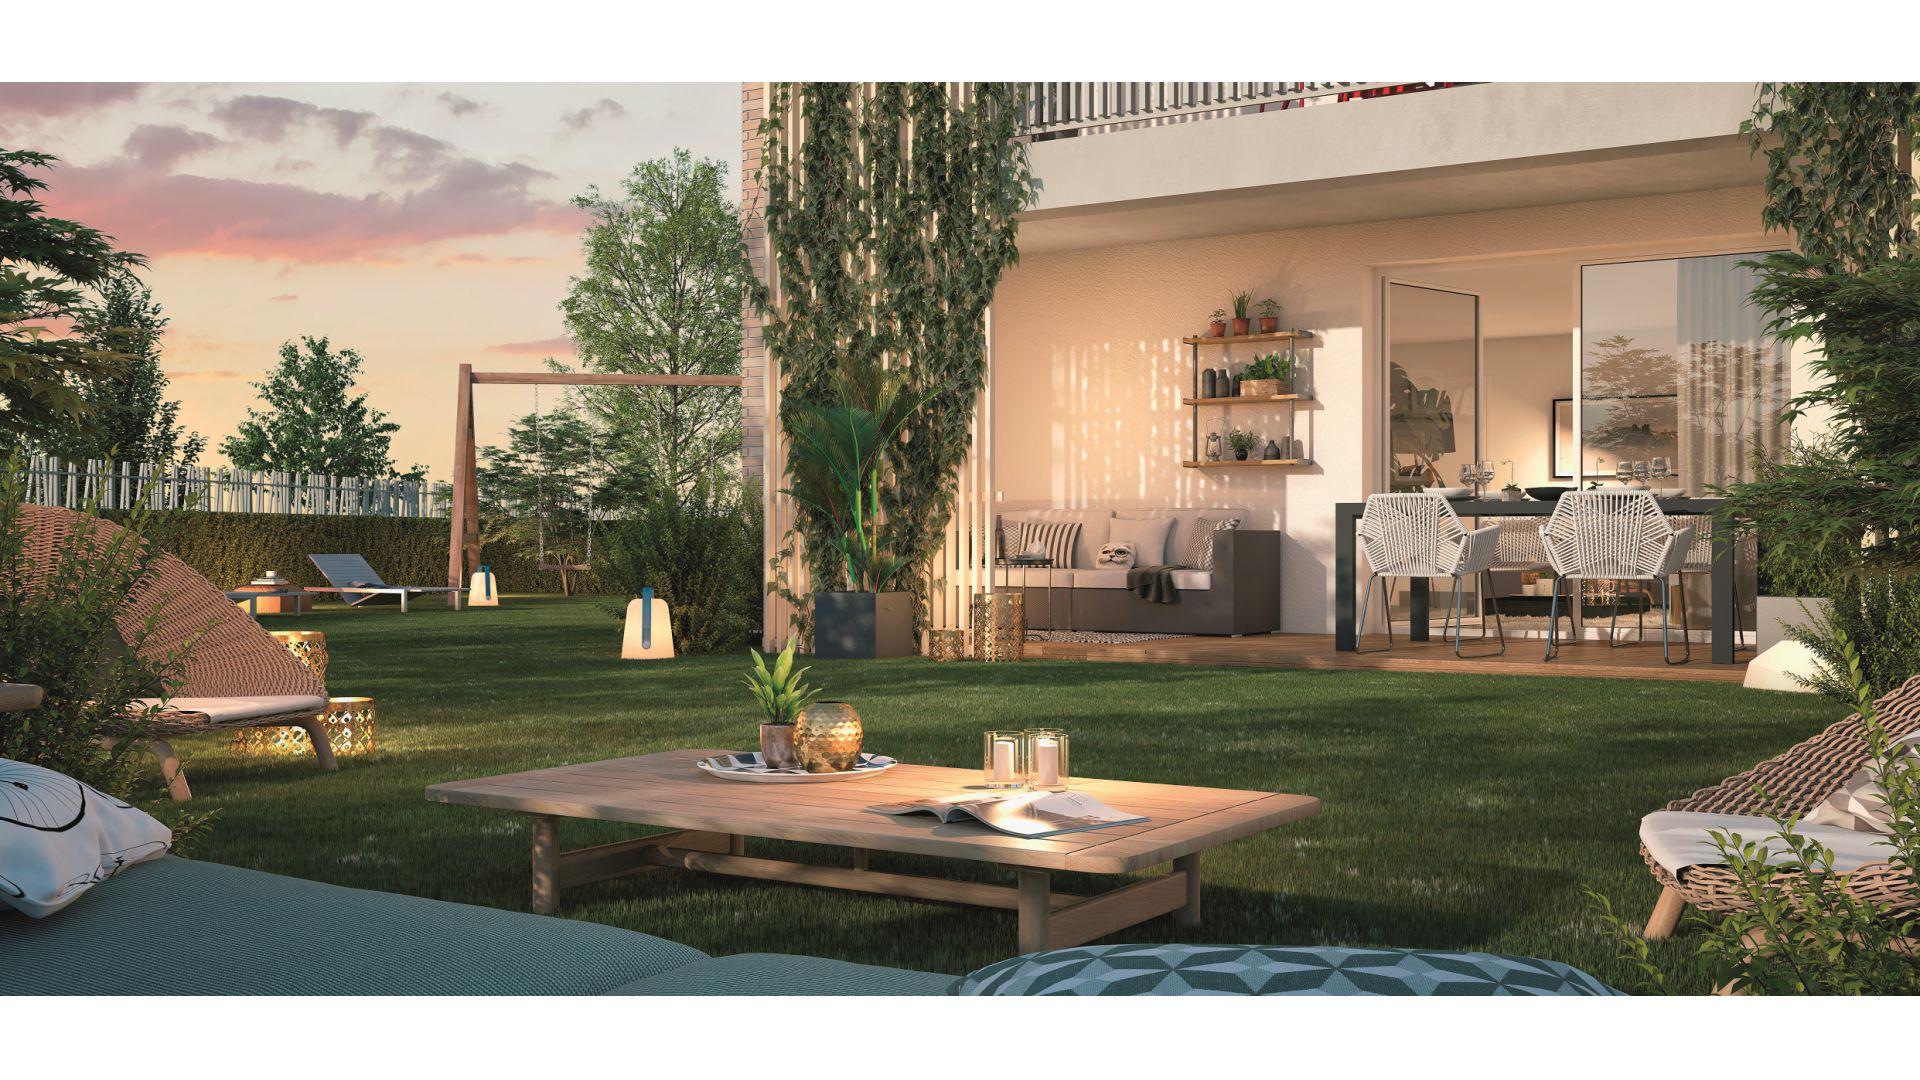 GreenCity immobilier - achat appartement neuf Toulouse Saint-Simon - 31100 - Résidence Val'oriane - T2 - T3 - T4 - vue terrasse